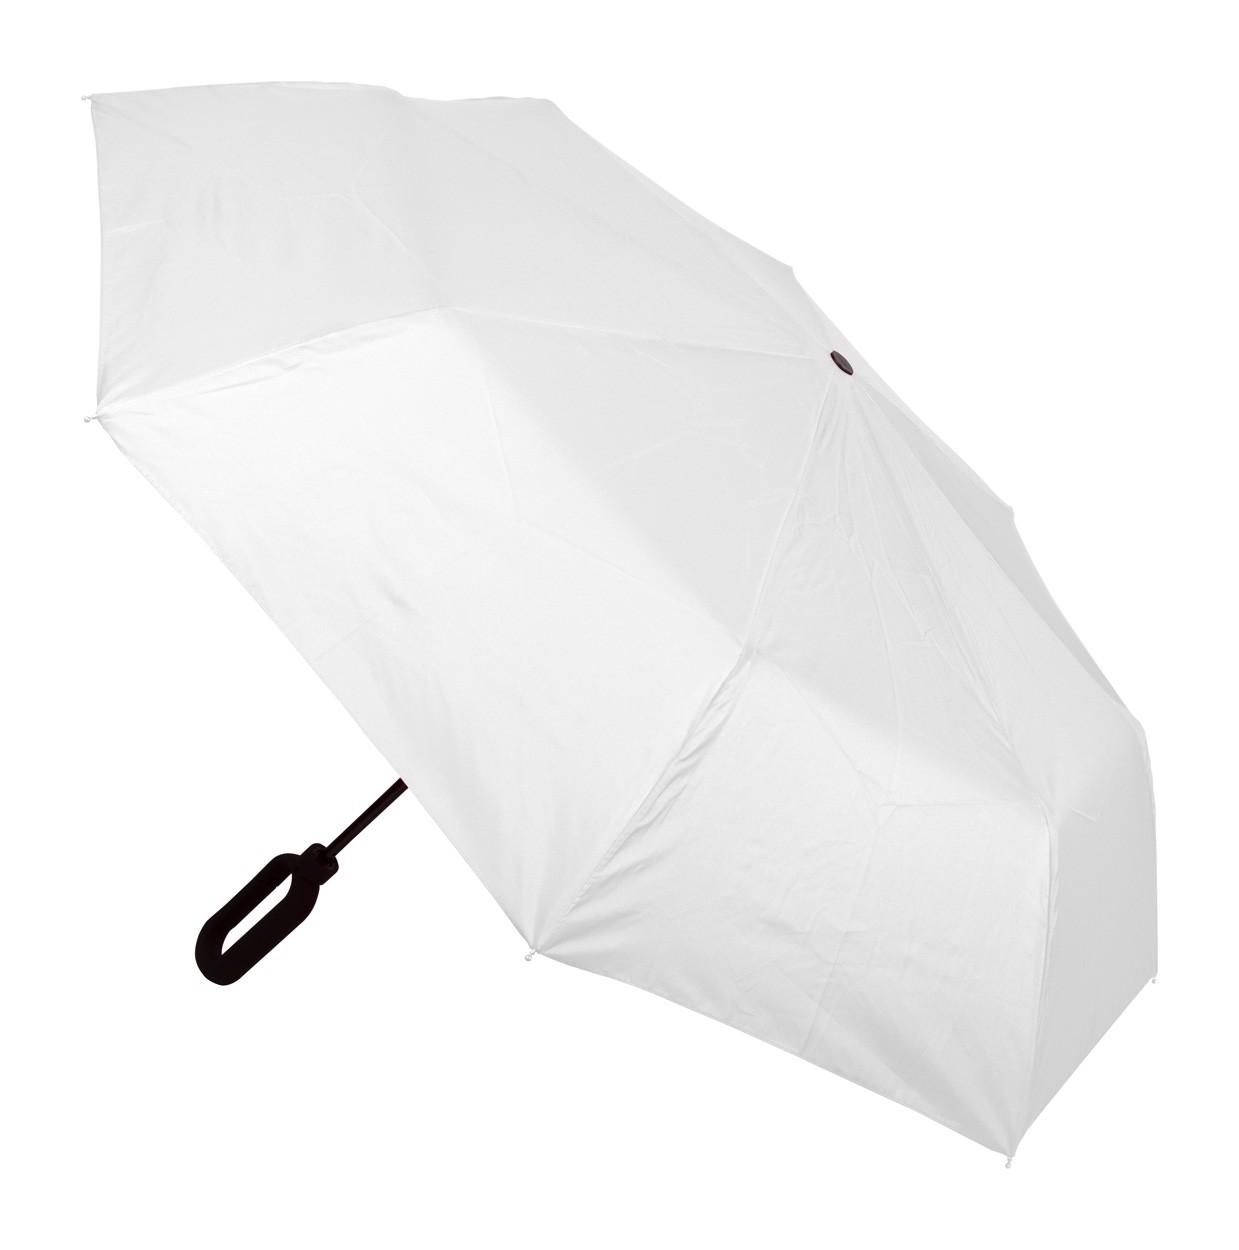 Umbrella Brosmon - White